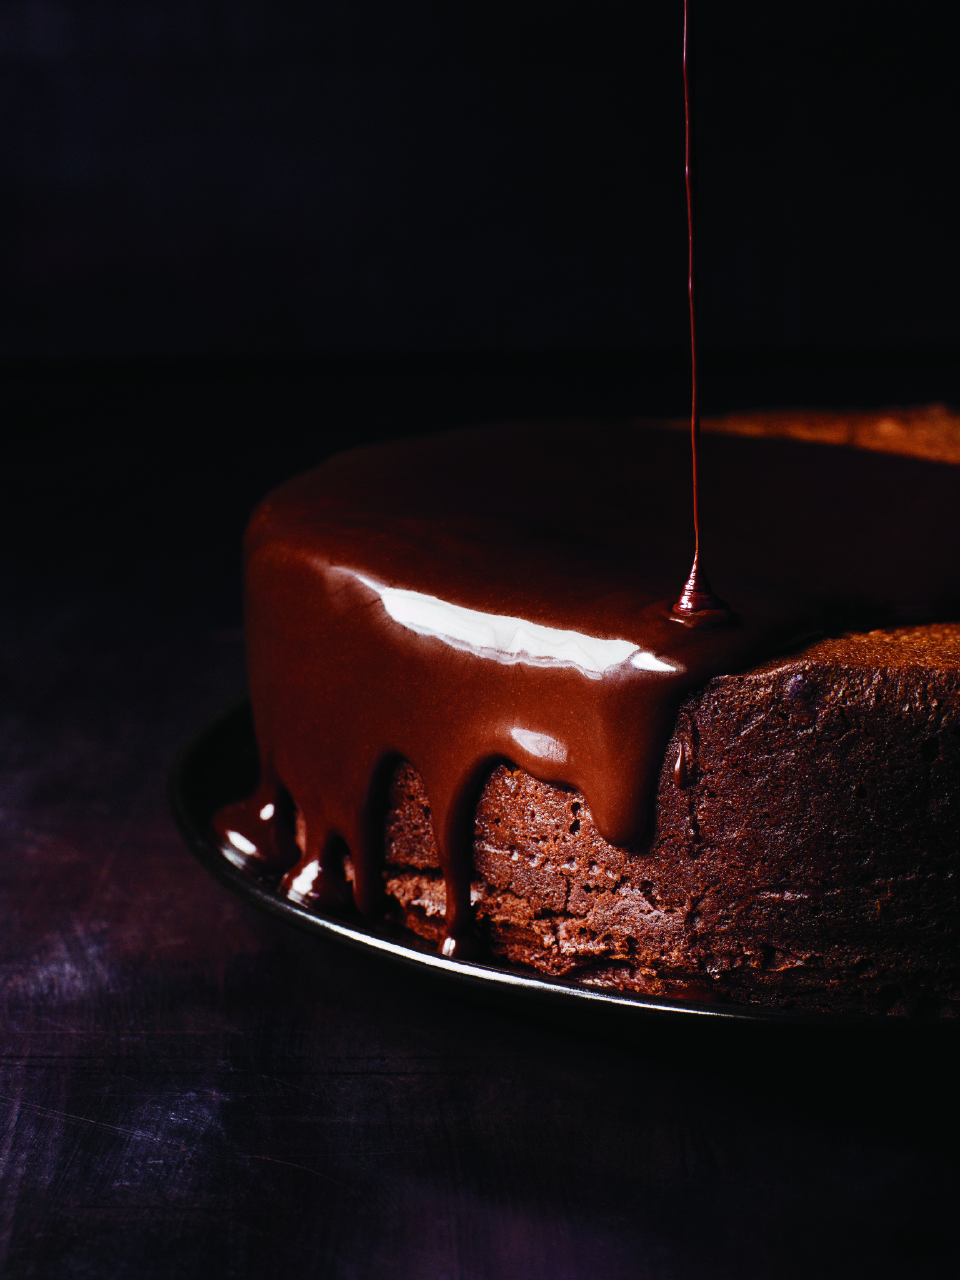 darkest-chocolate-cake-with-red-wine-glaze against a dark background